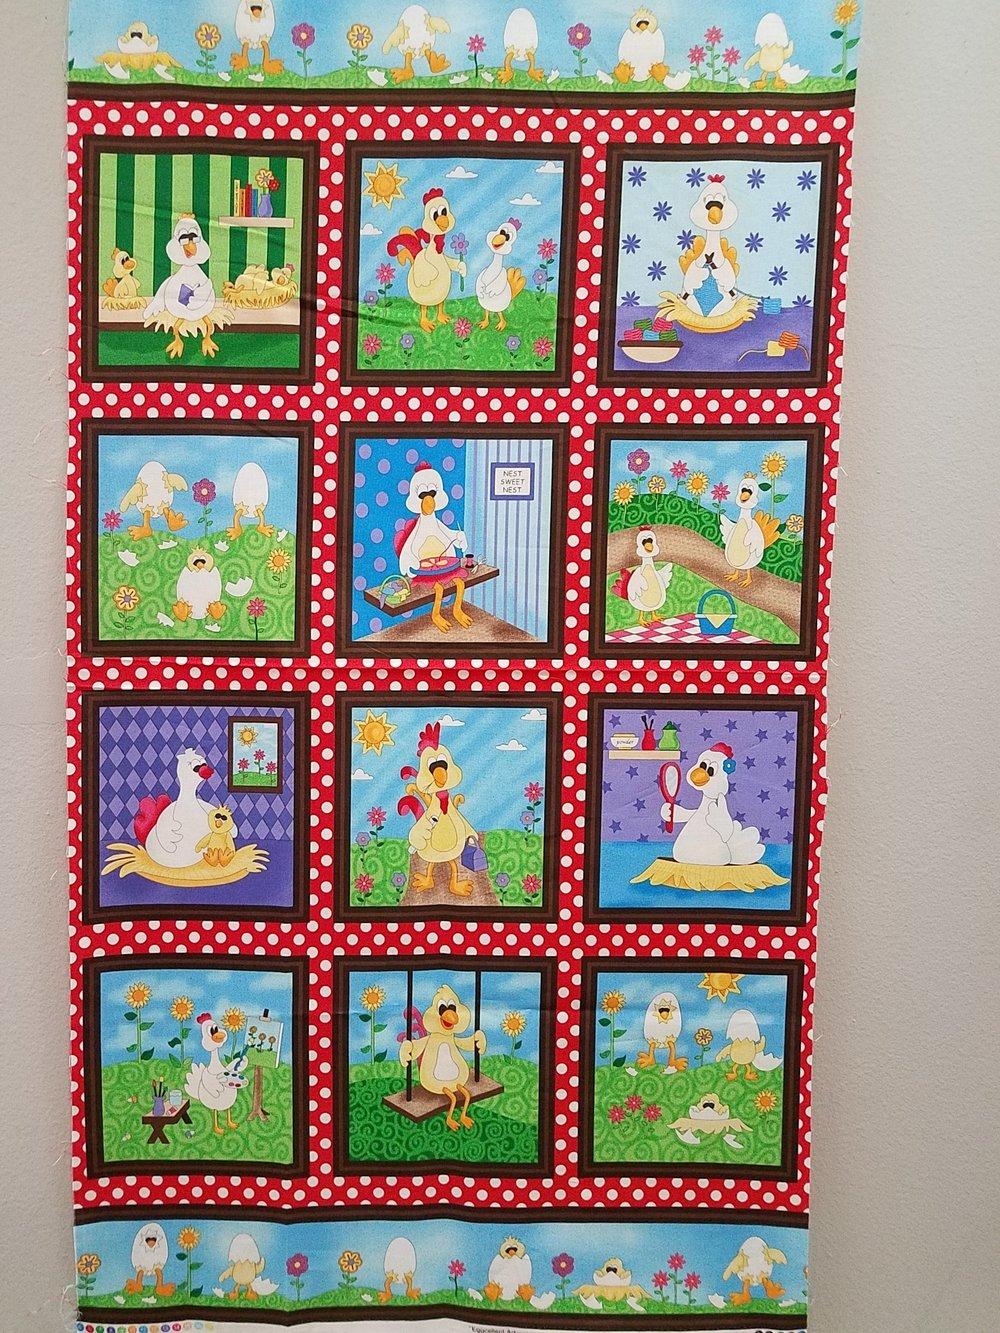 Eggcellent Adventures Panel by Heidi Pridemore for Fabri-Quilt